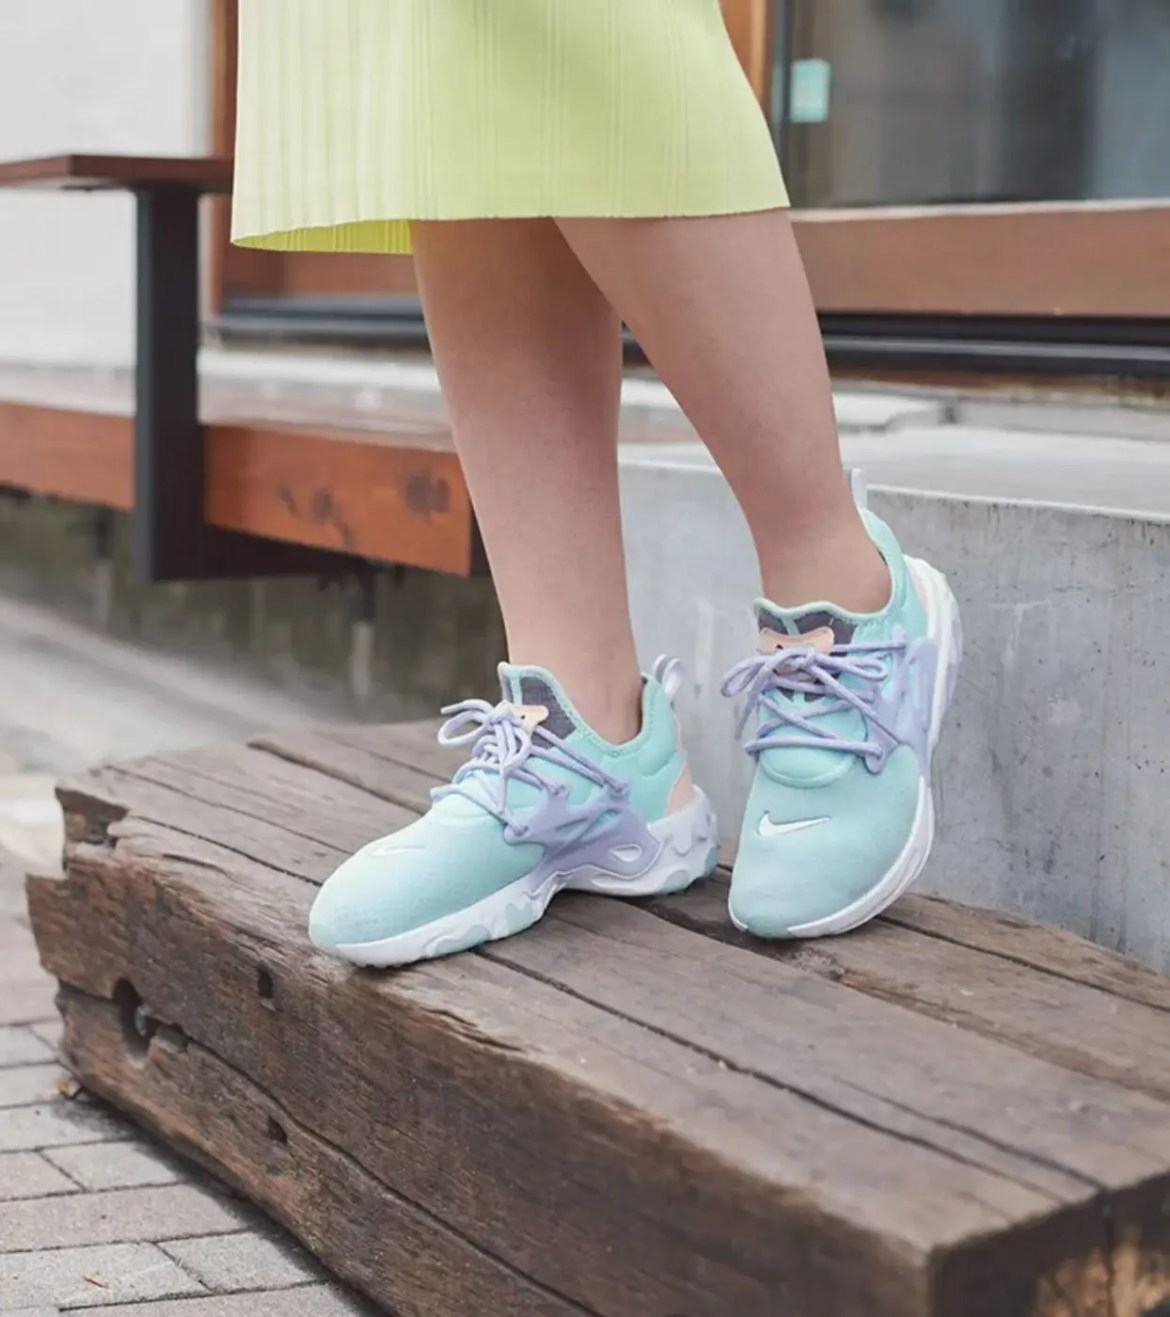 Nike-REACT-PRESTO-SHAVED-ICE-04